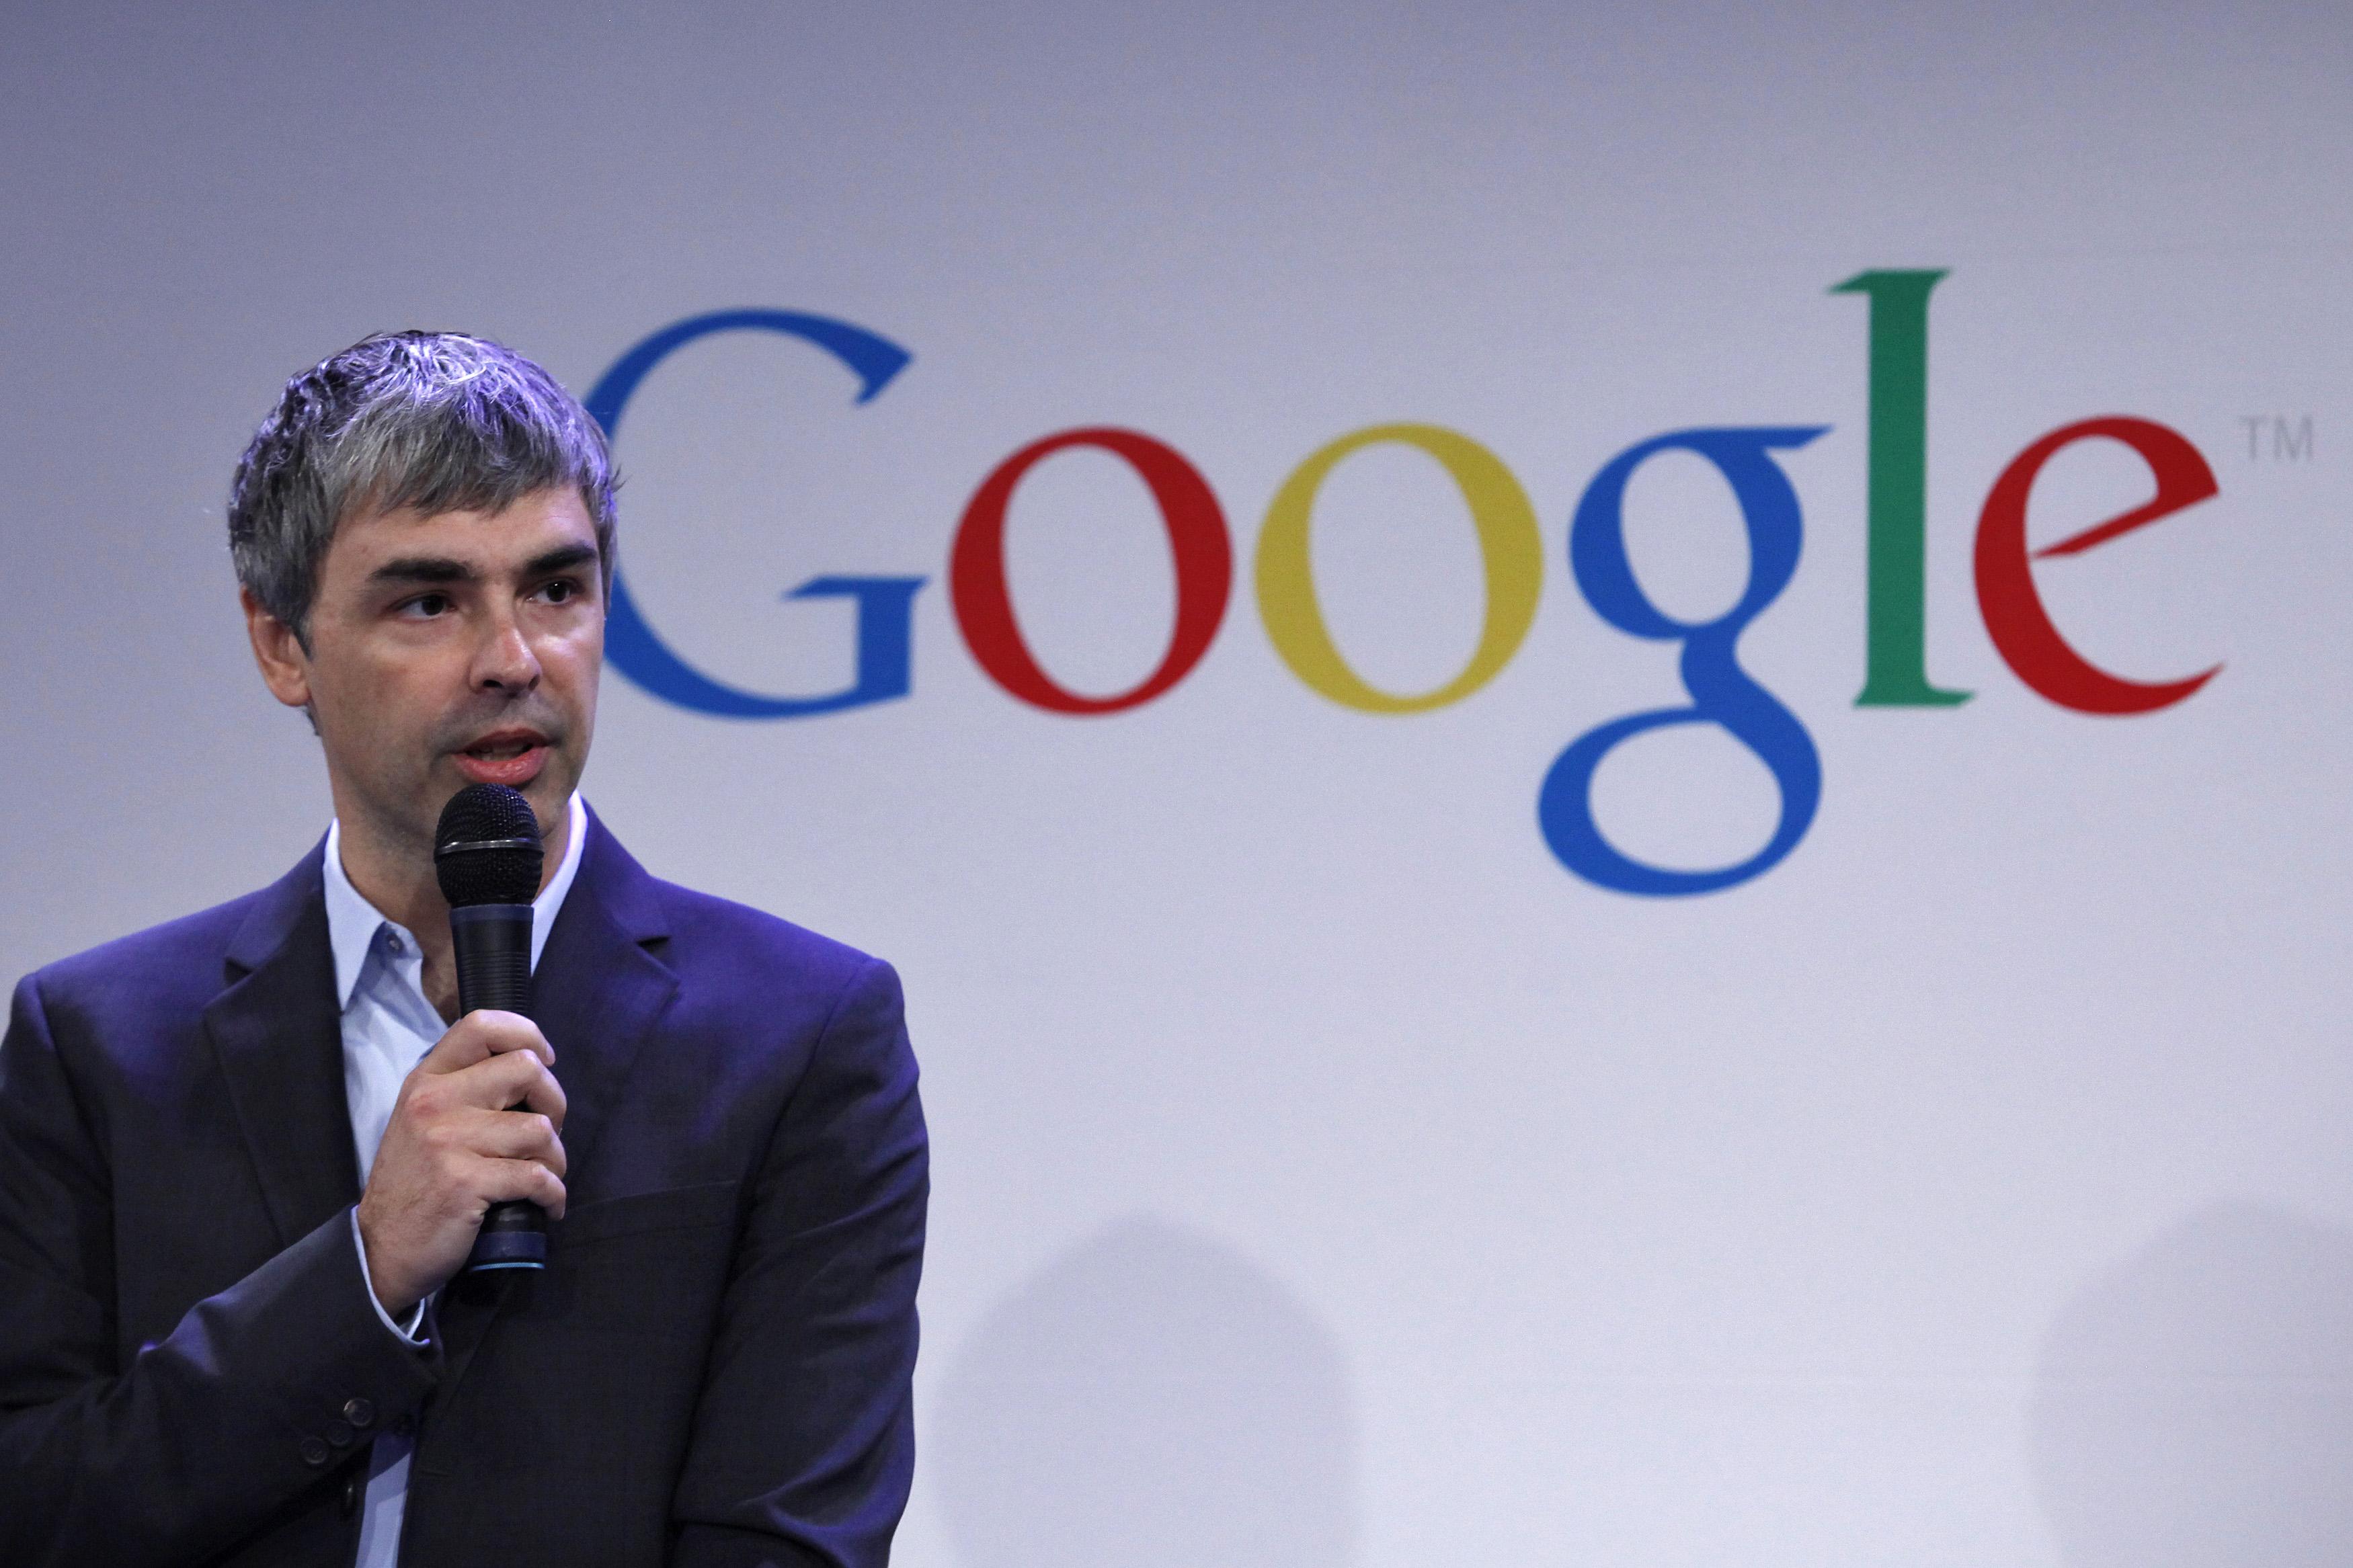 Google 重組更名為 Alphabet 集團,此後你熟知的 Google 成為子公司